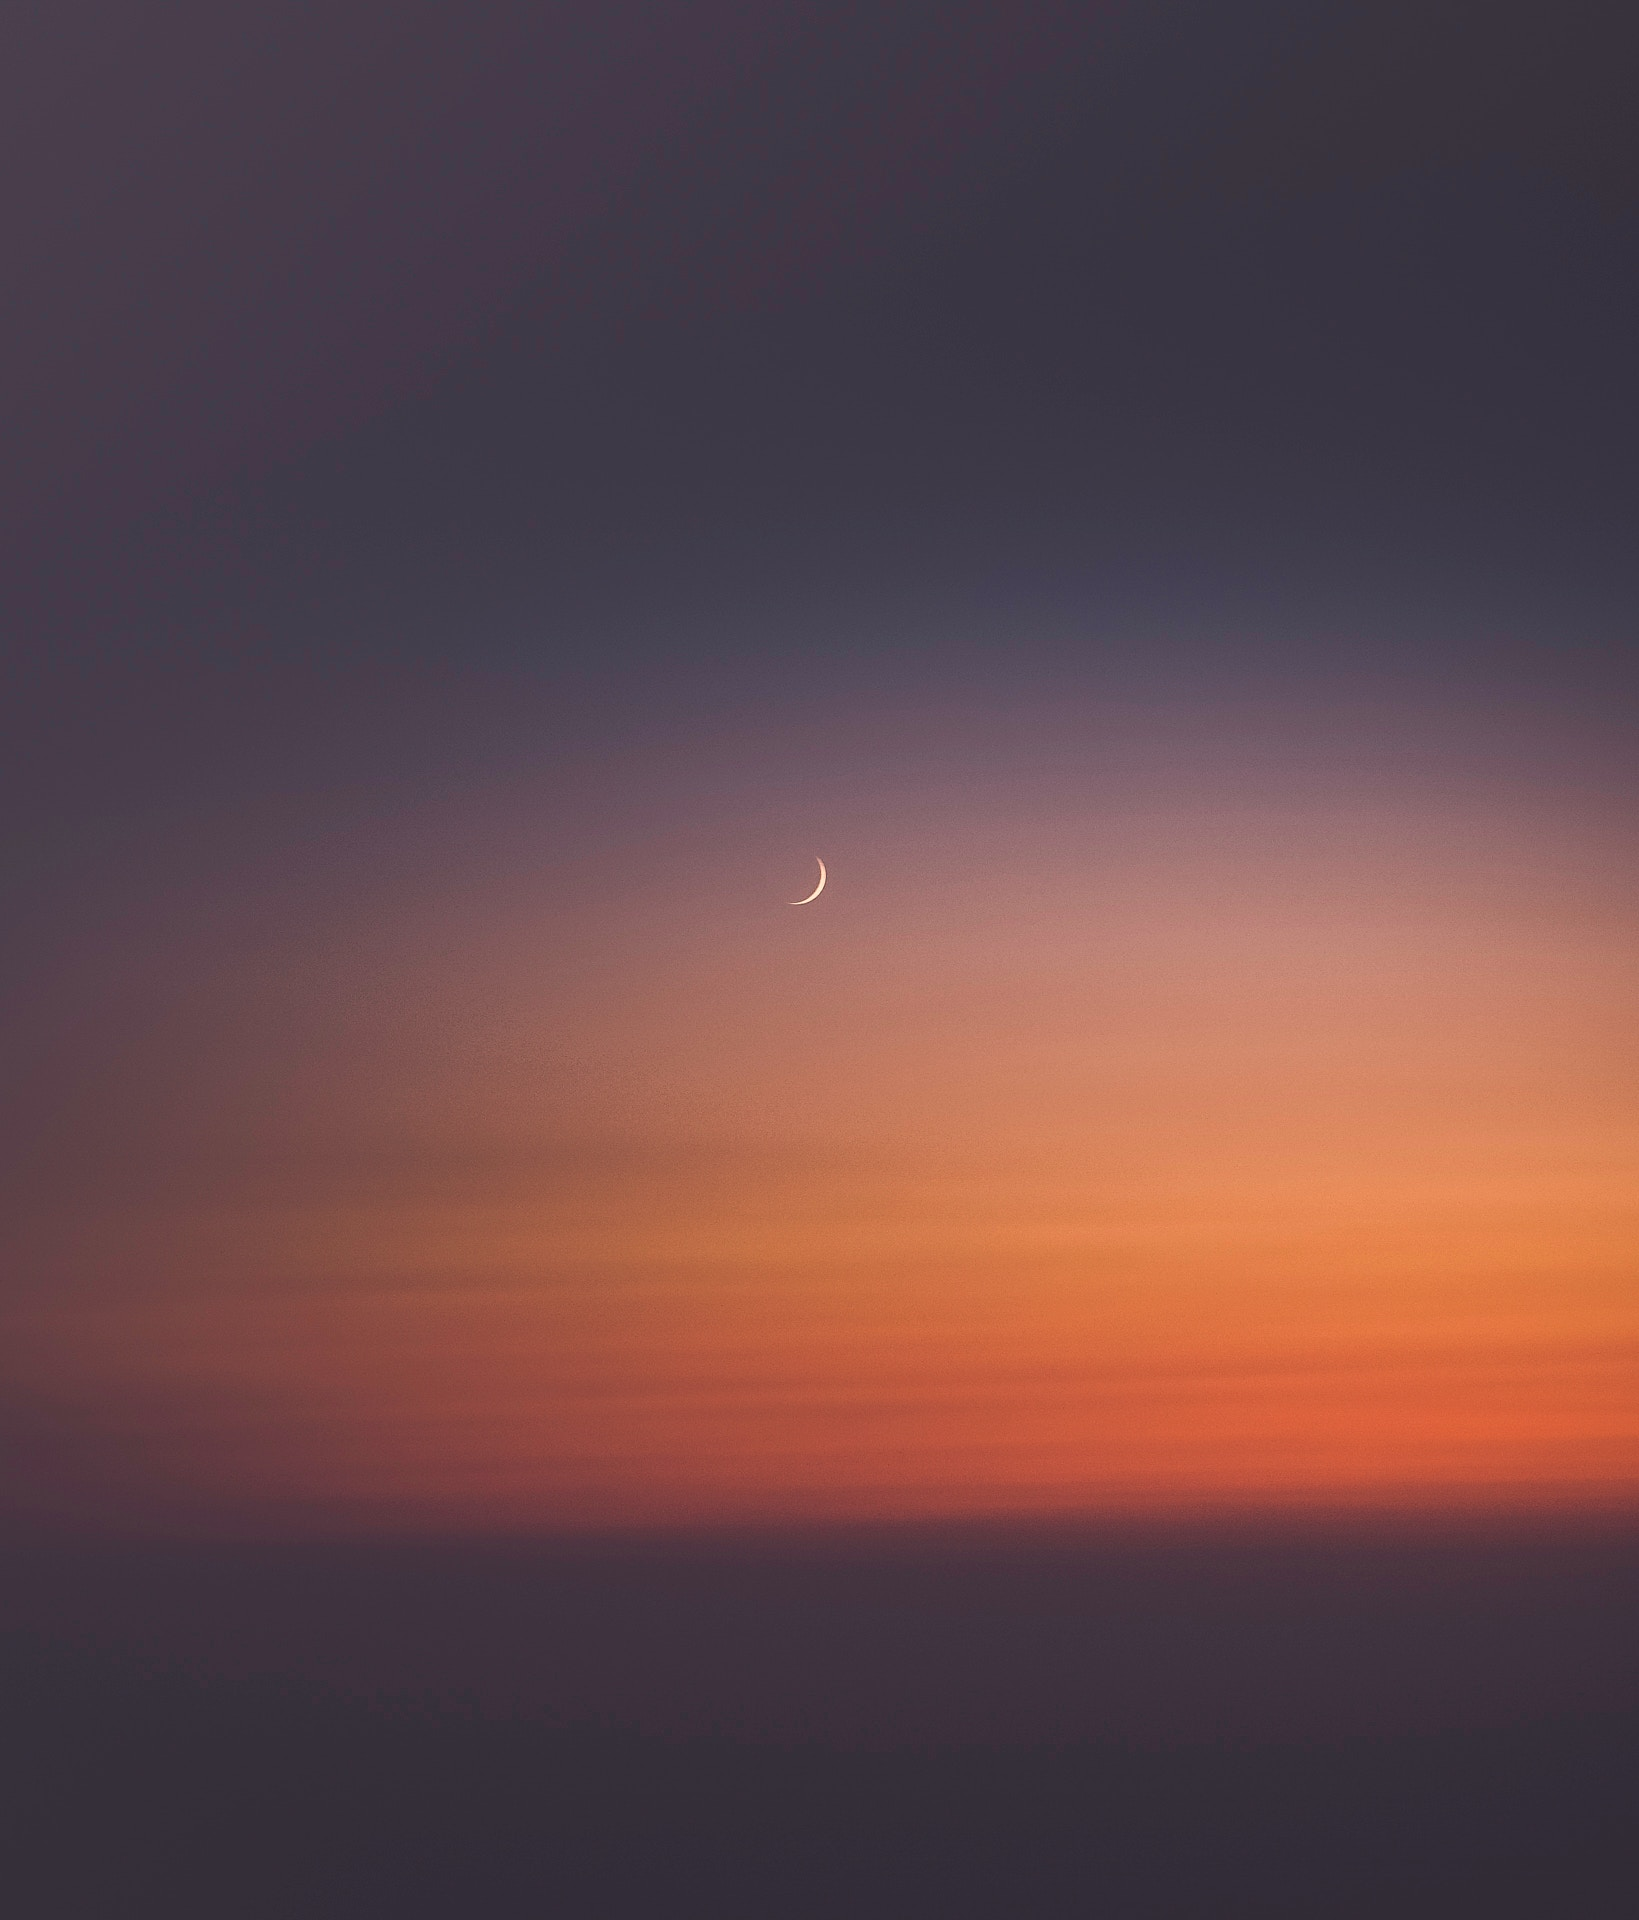 The Night of Eid and Sunnahs of Eid al-Fitr